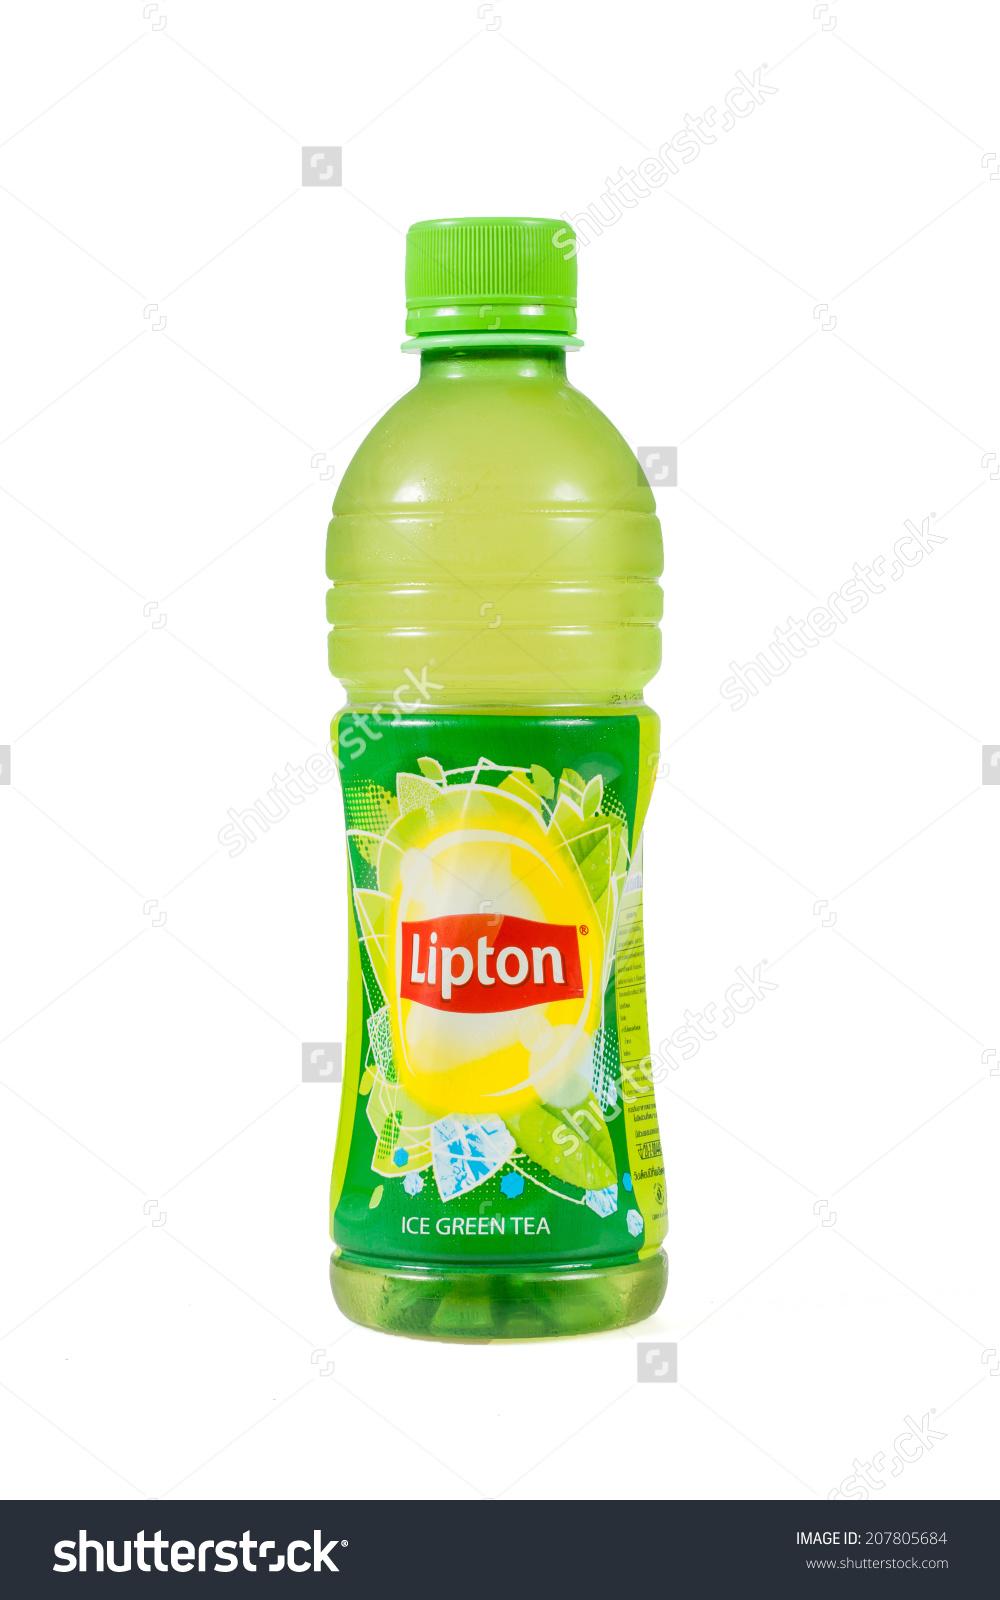 Litom??ice clipart #4